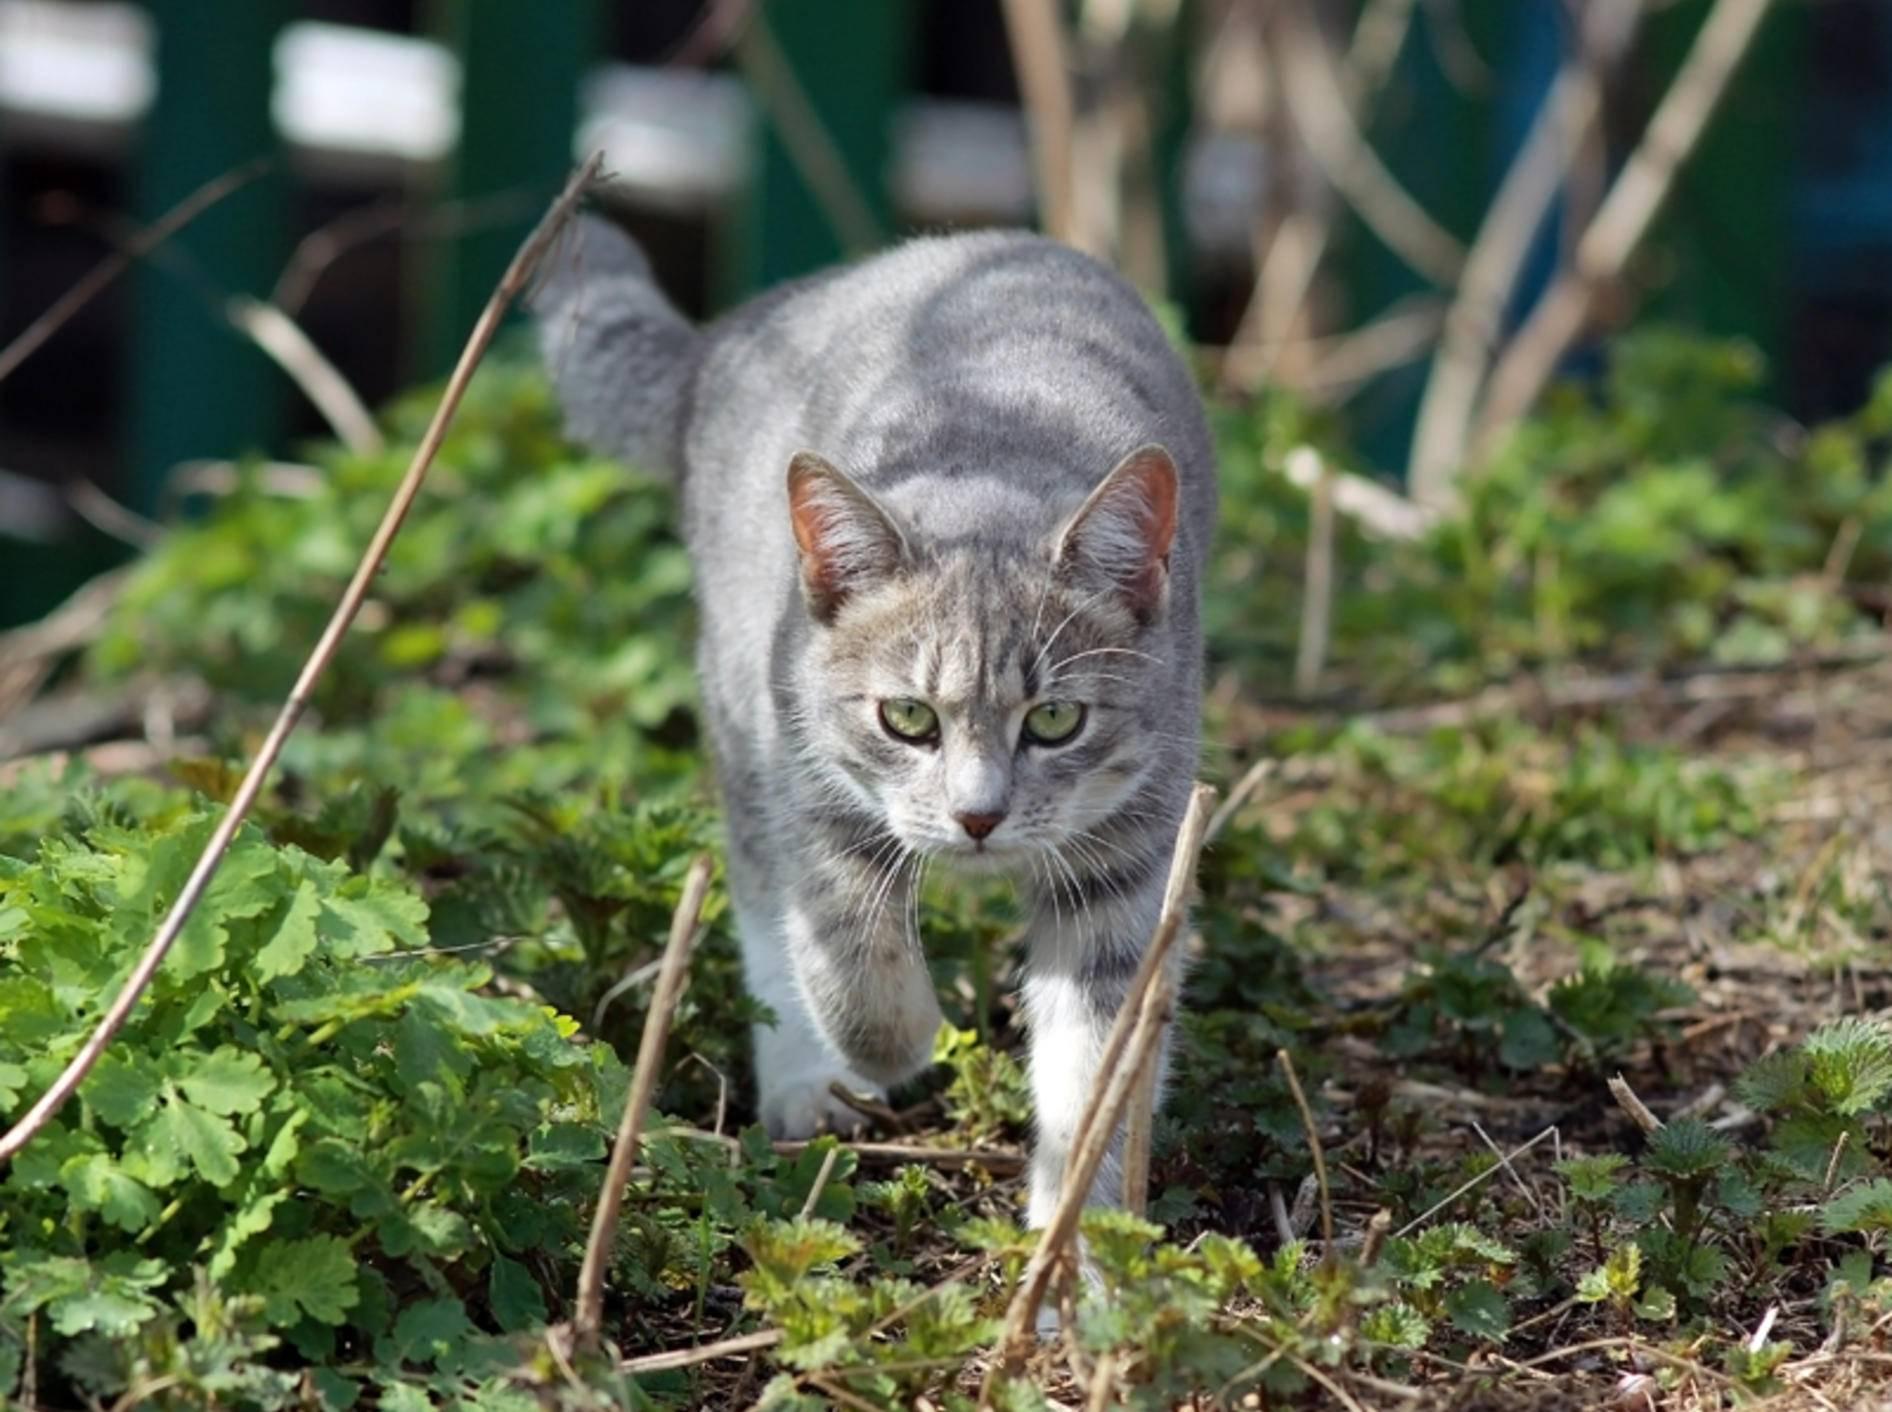 Diese hübsche silbergraue Tabby-Katze hat offenbar gerade eine Maus erblickt und schleicht sich gaaanz leise an – Shutterstock / He Shixin